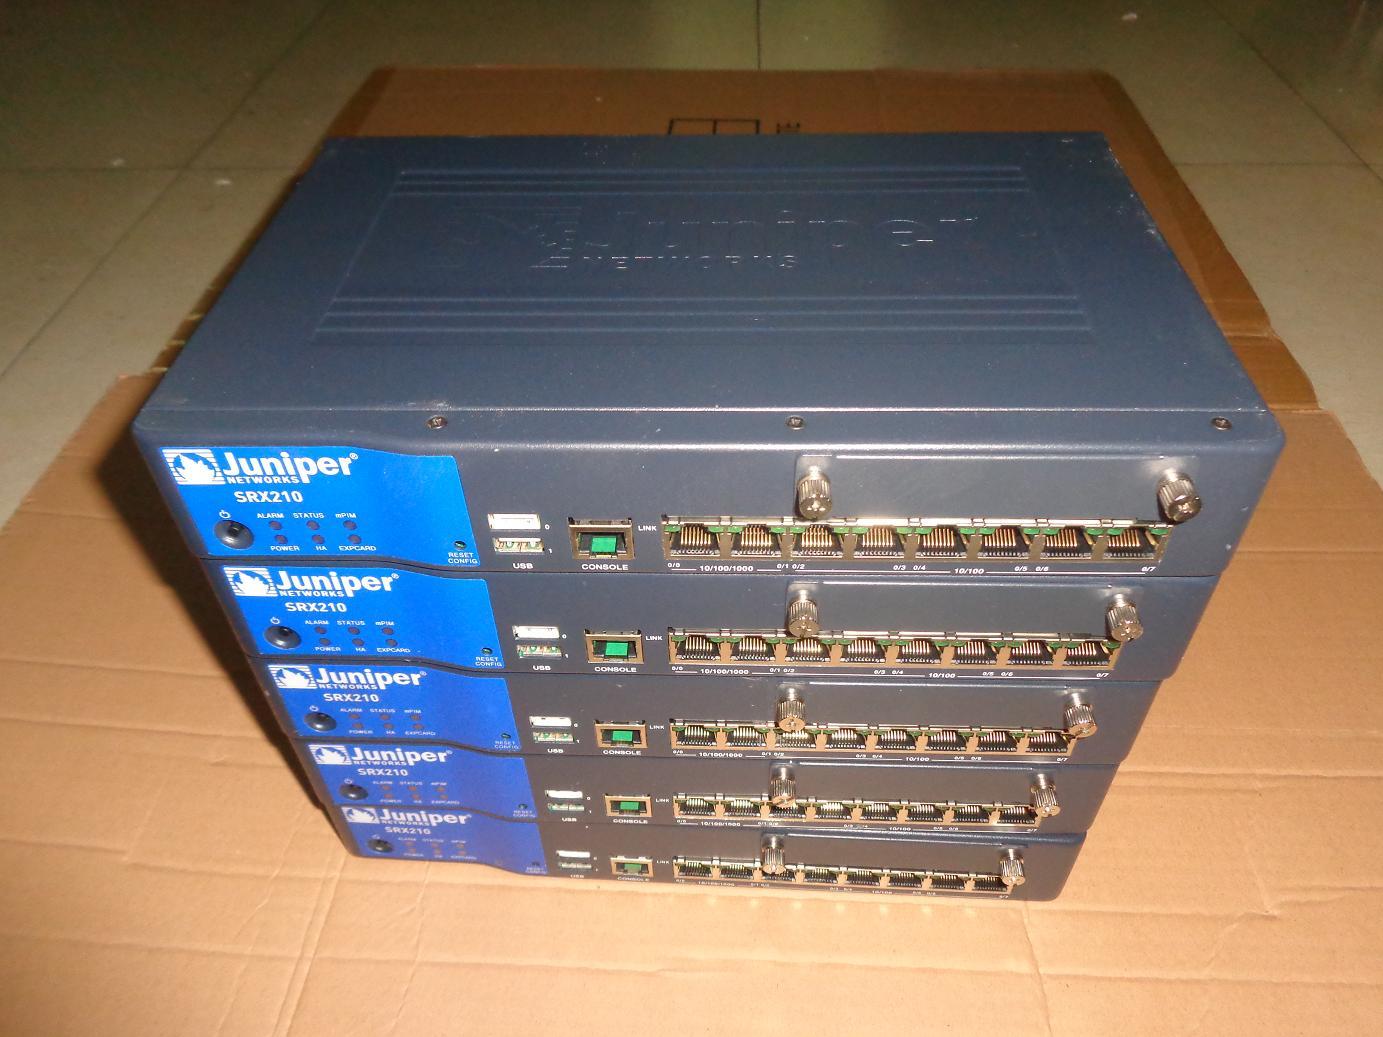 Сетевое оборудование Juniper SRX210 SRX210HE комбайн ves 3001